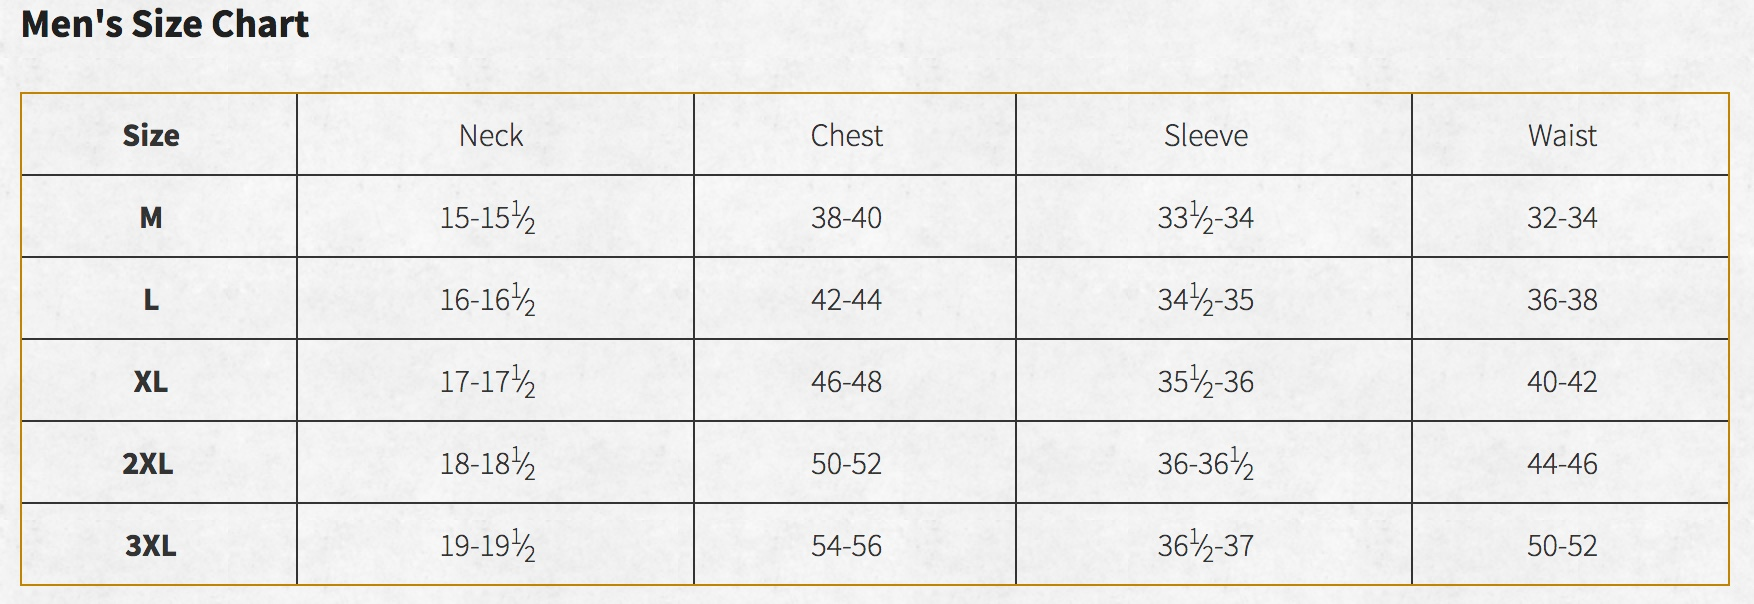 bb-size-chart-mens-.jpeg